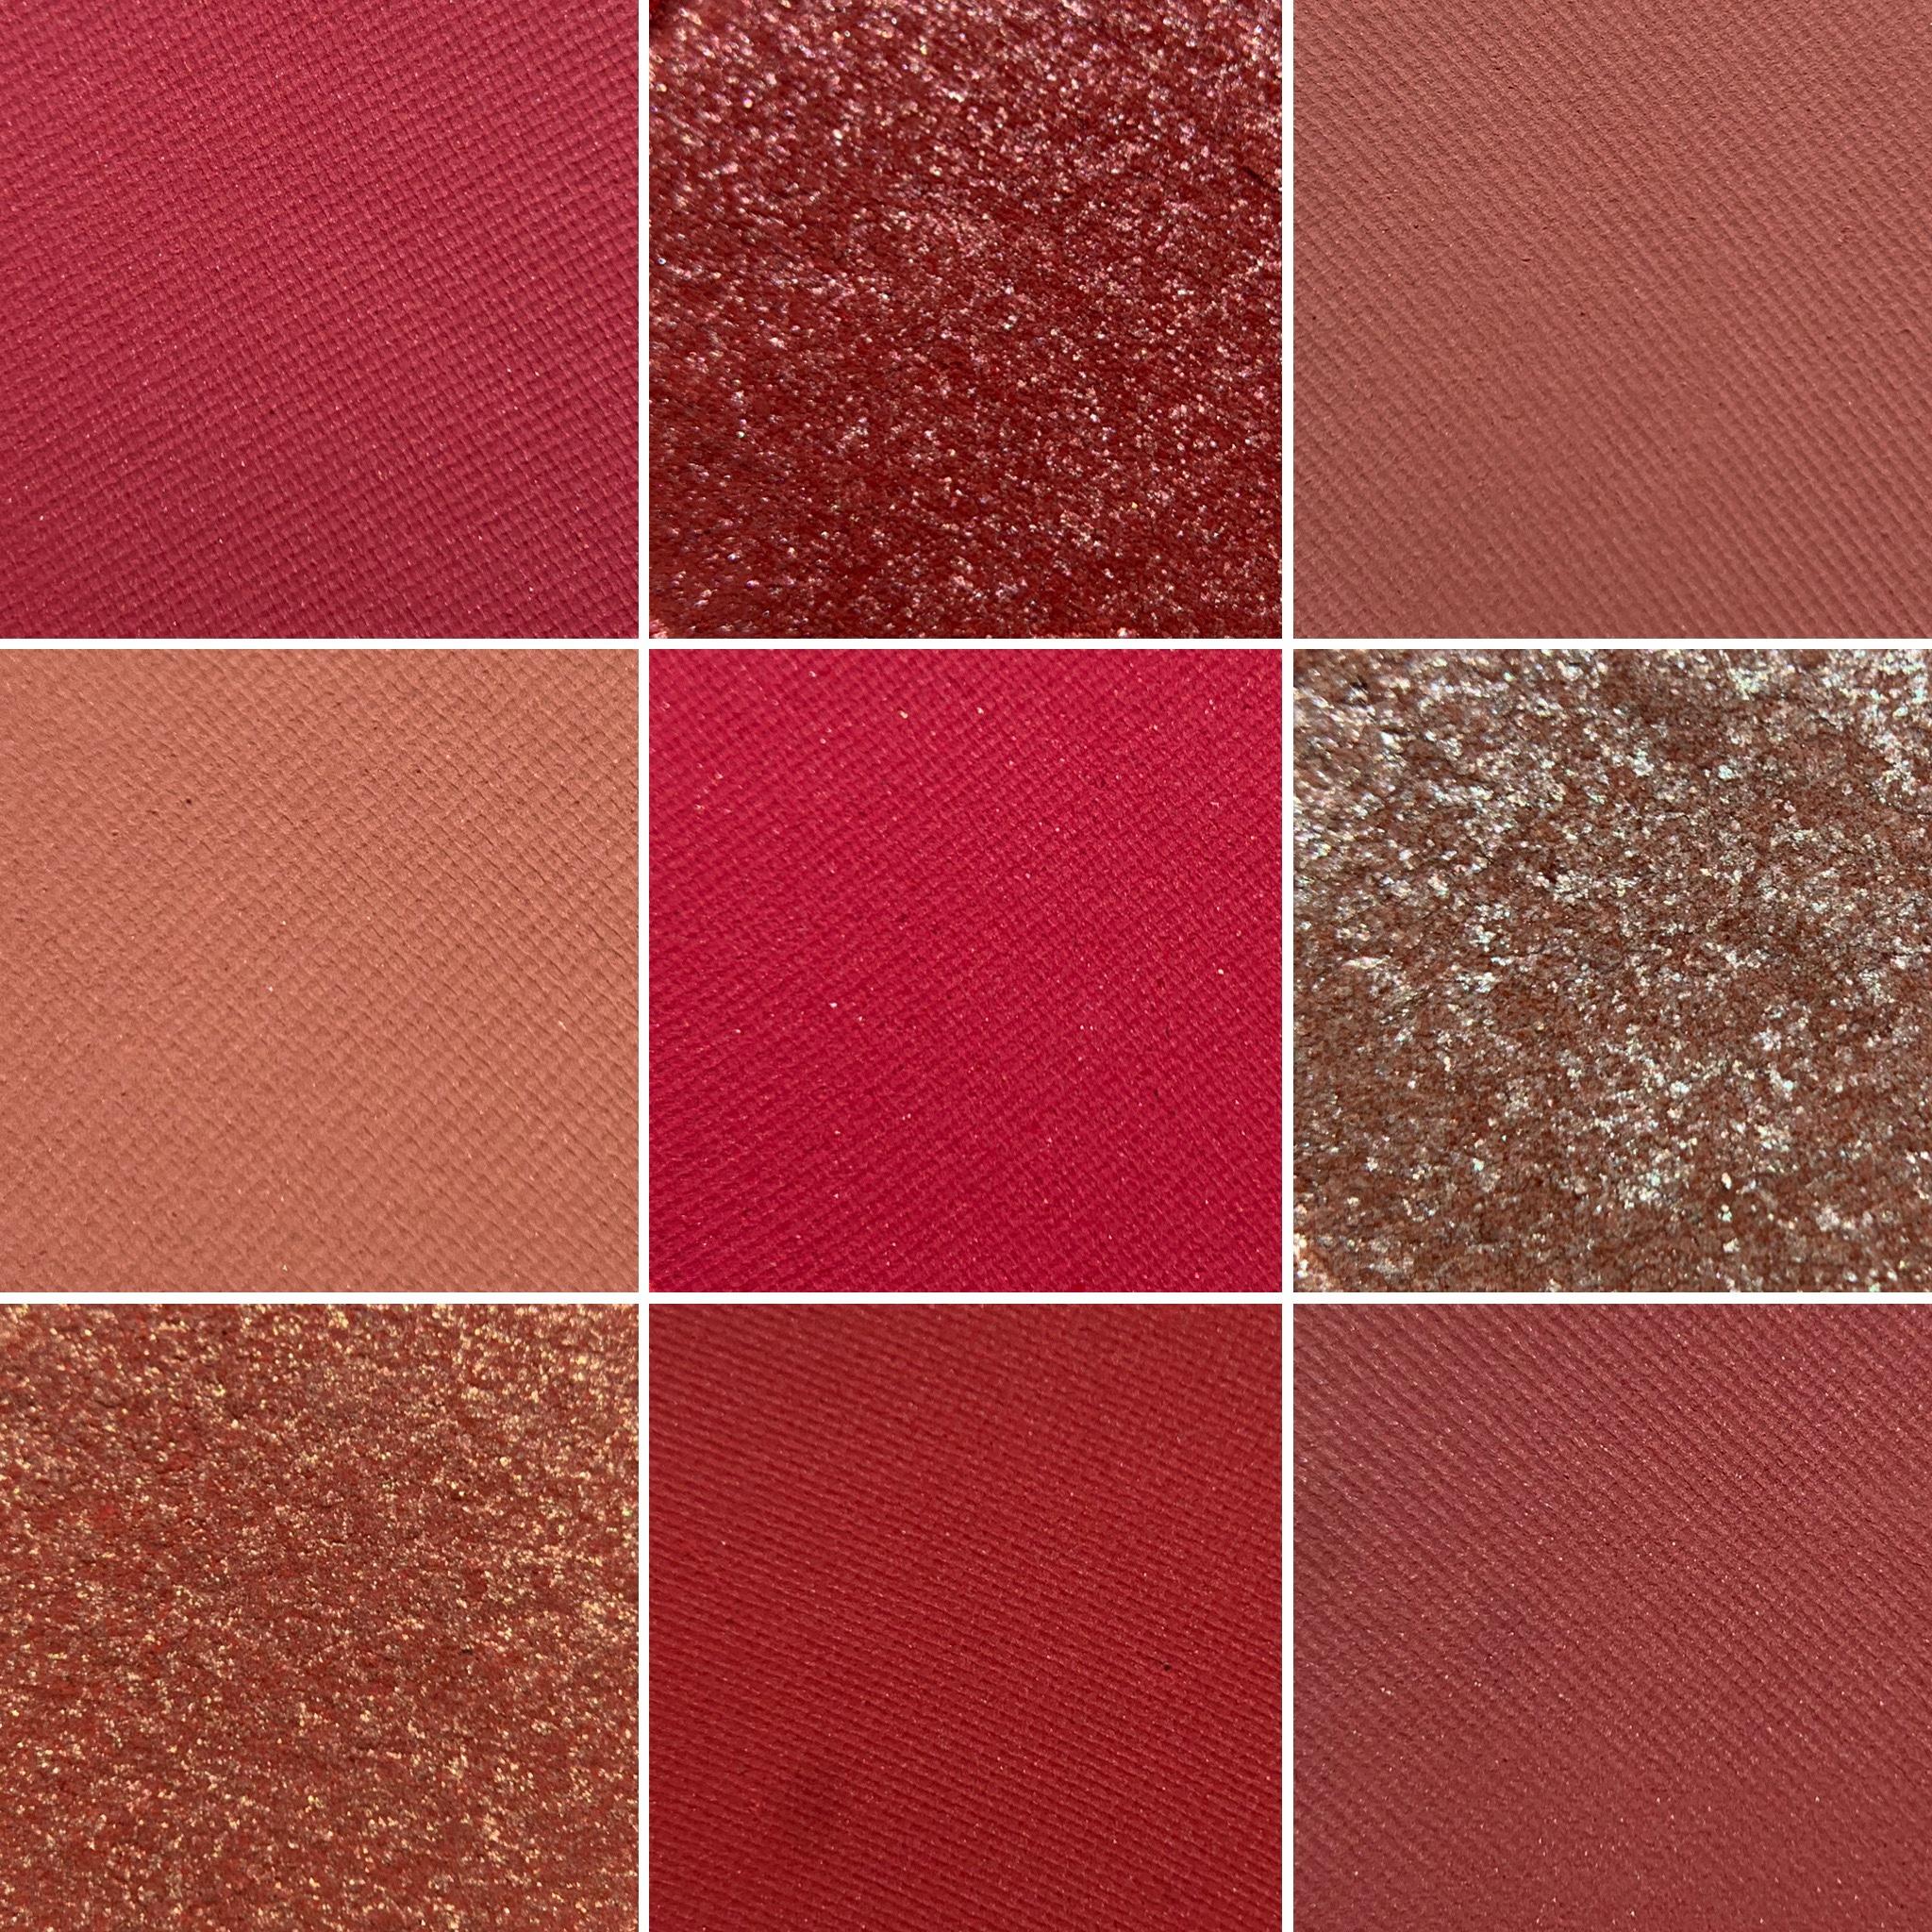 Colourpop STRAWBERRY SHAKE palette photos & swatches